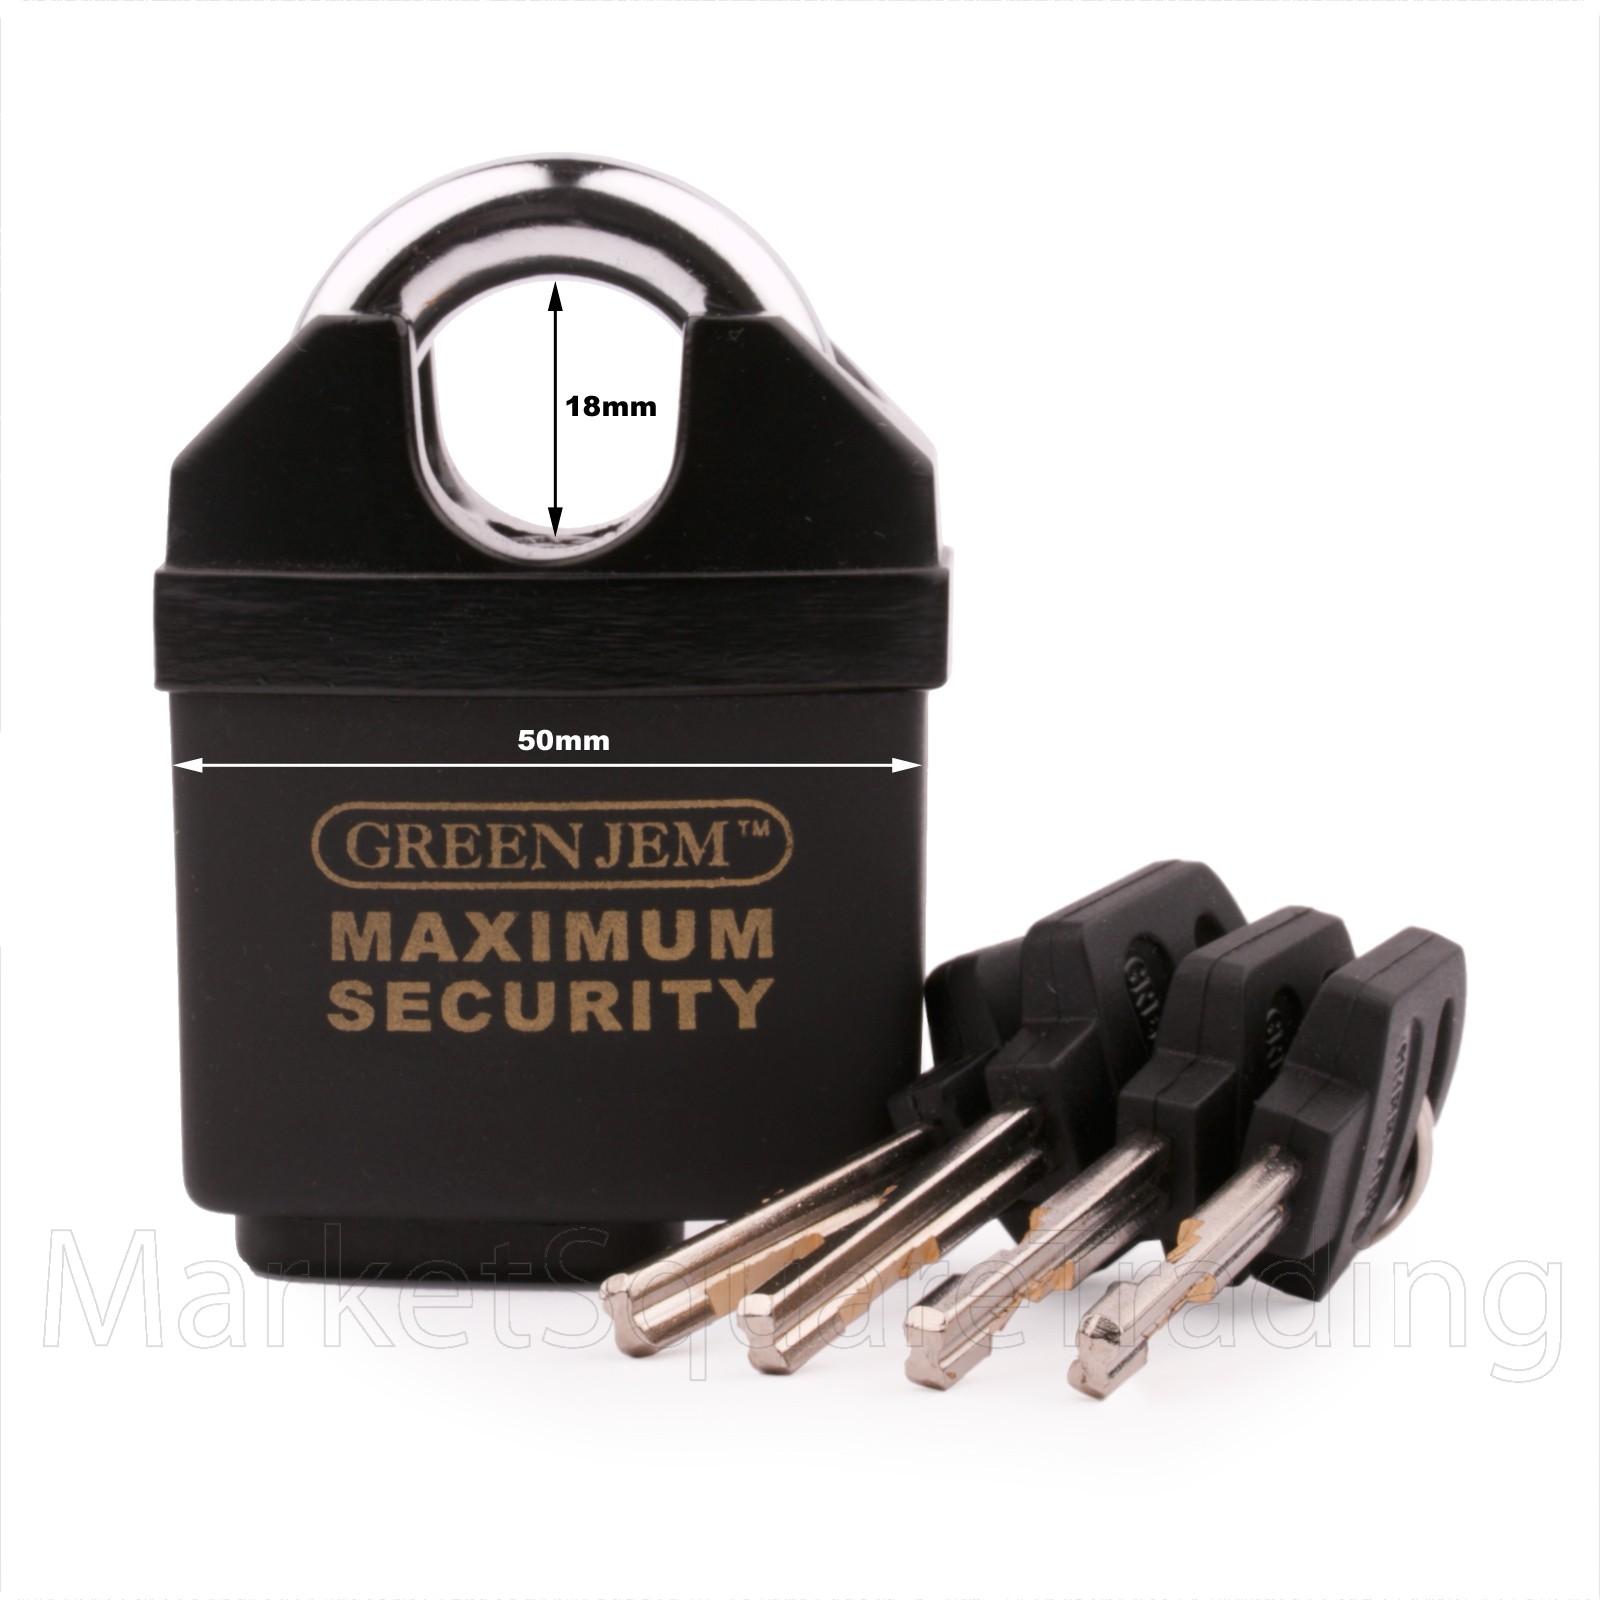 GREEN JEM PADLOCK 50mm CLOSED SHACKLE HIGH SECURITY